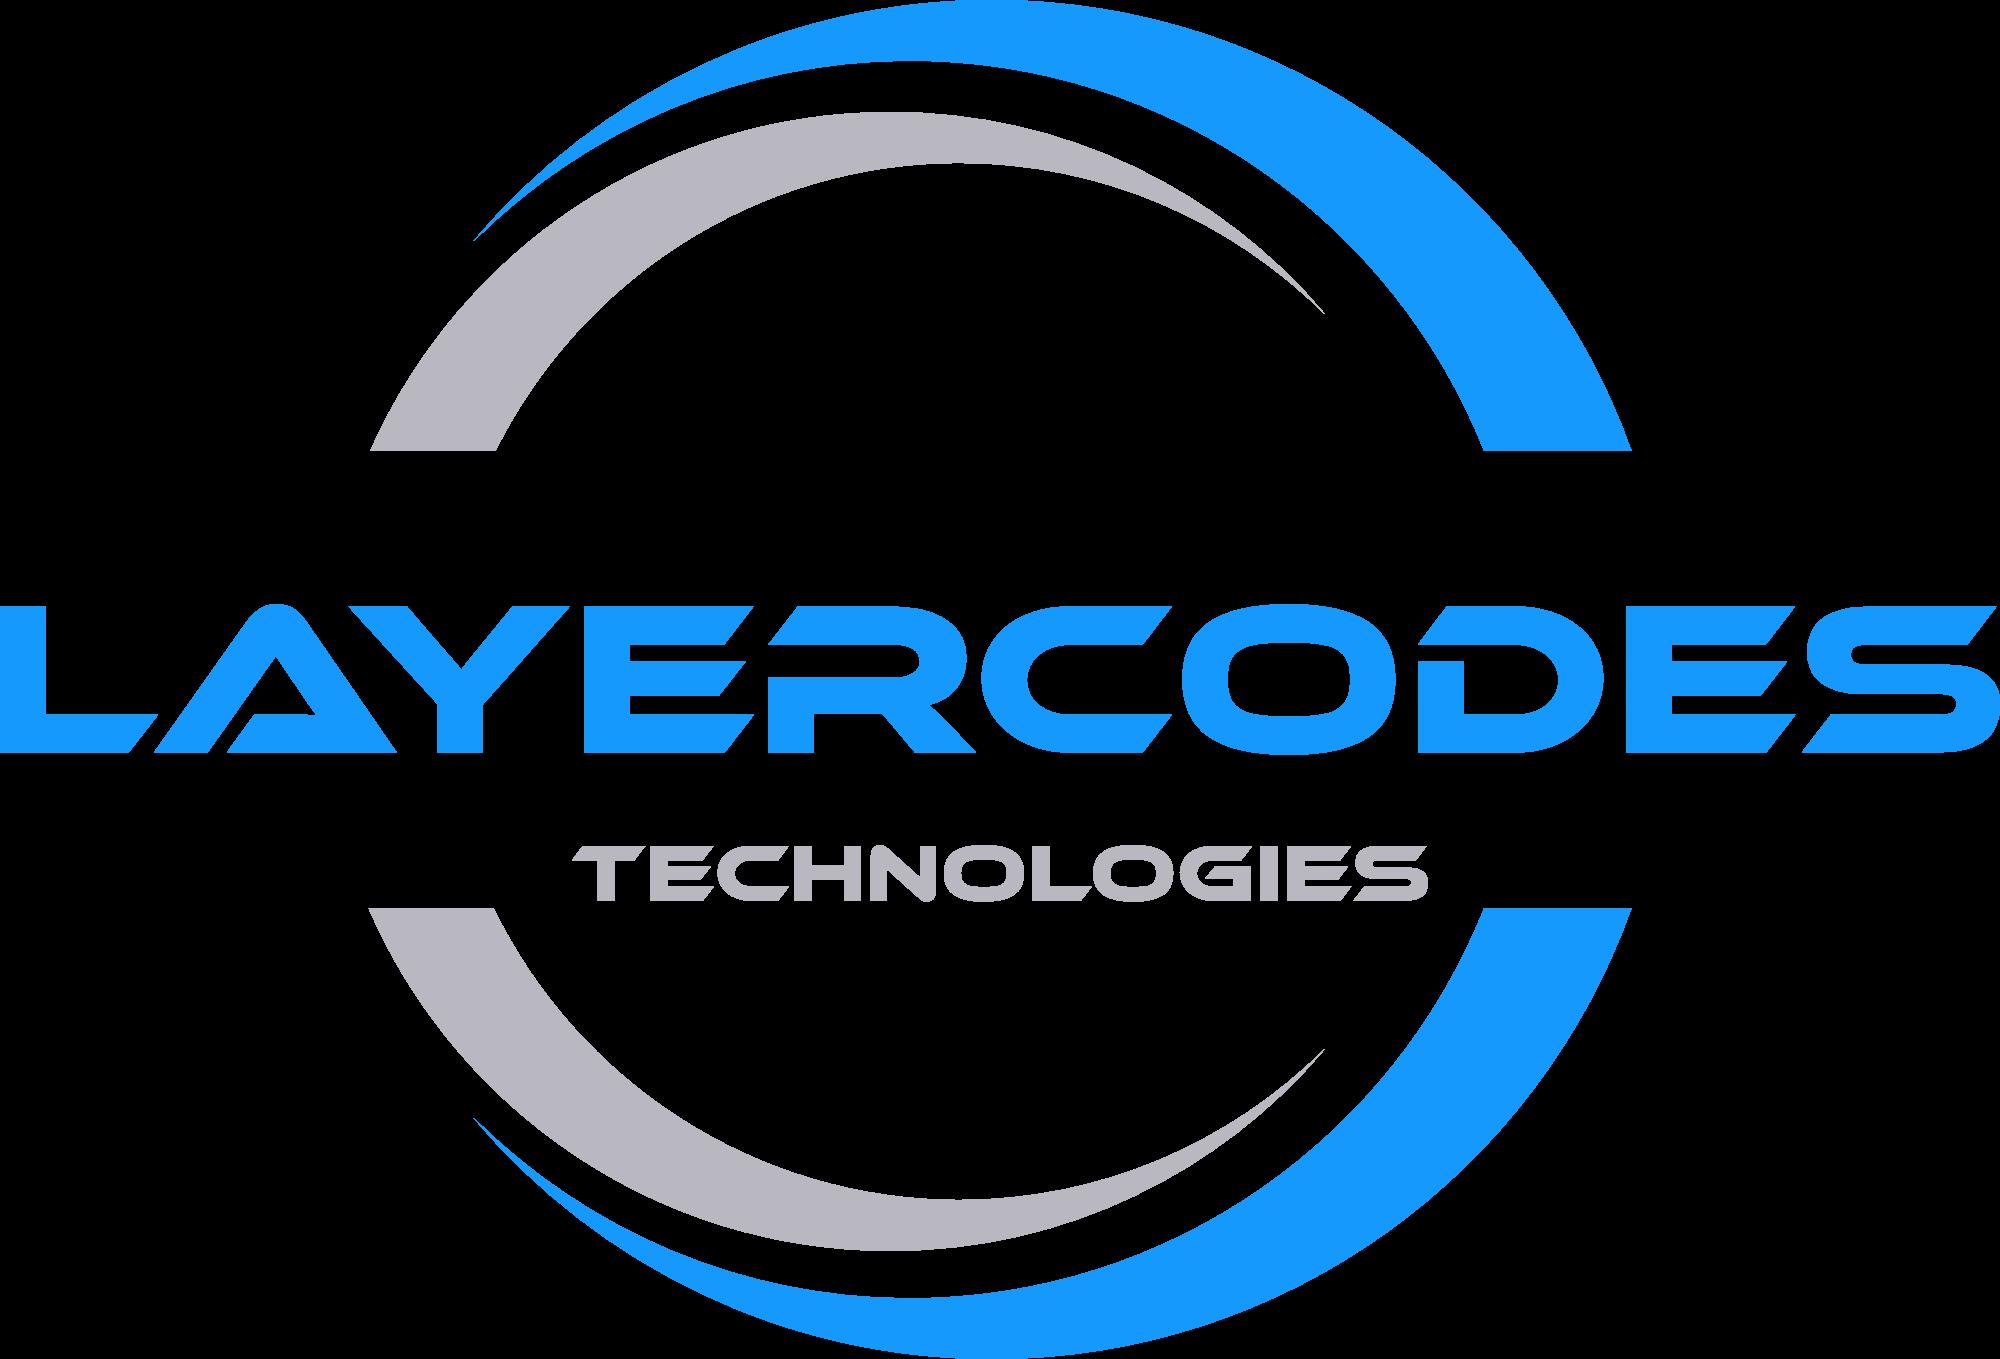 Layercodes Technologies